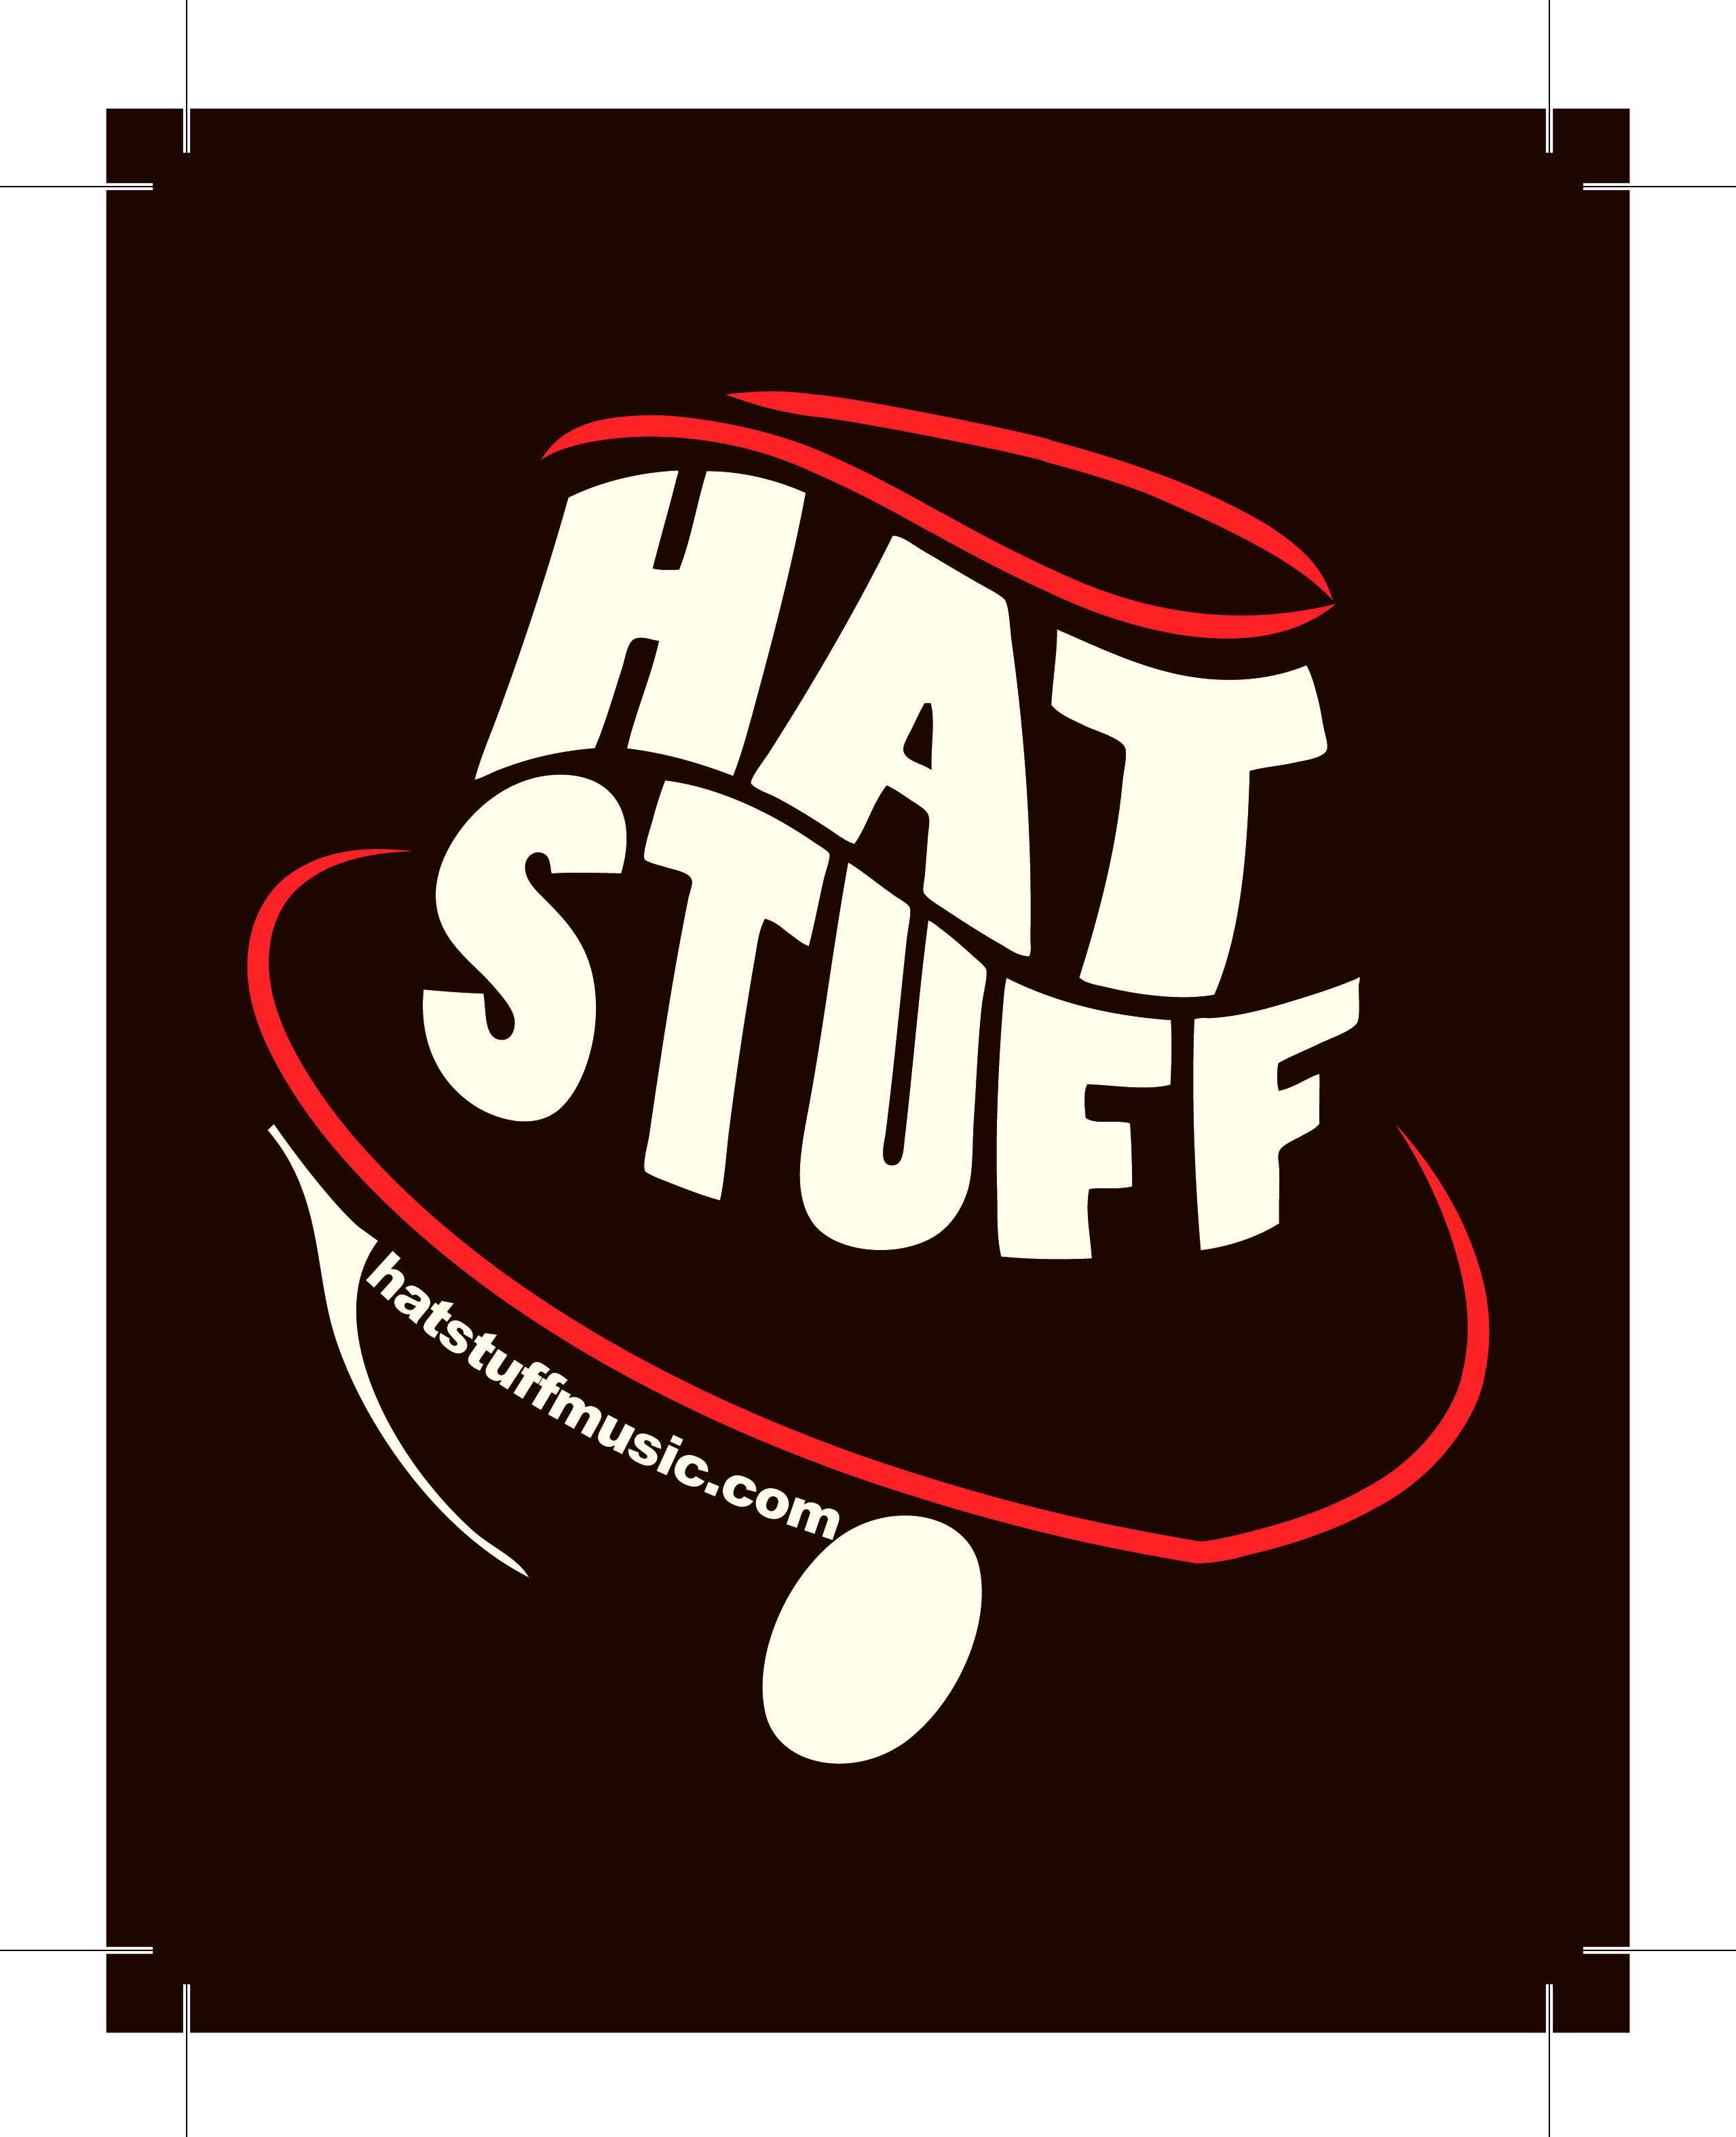 hat stuff.jpg